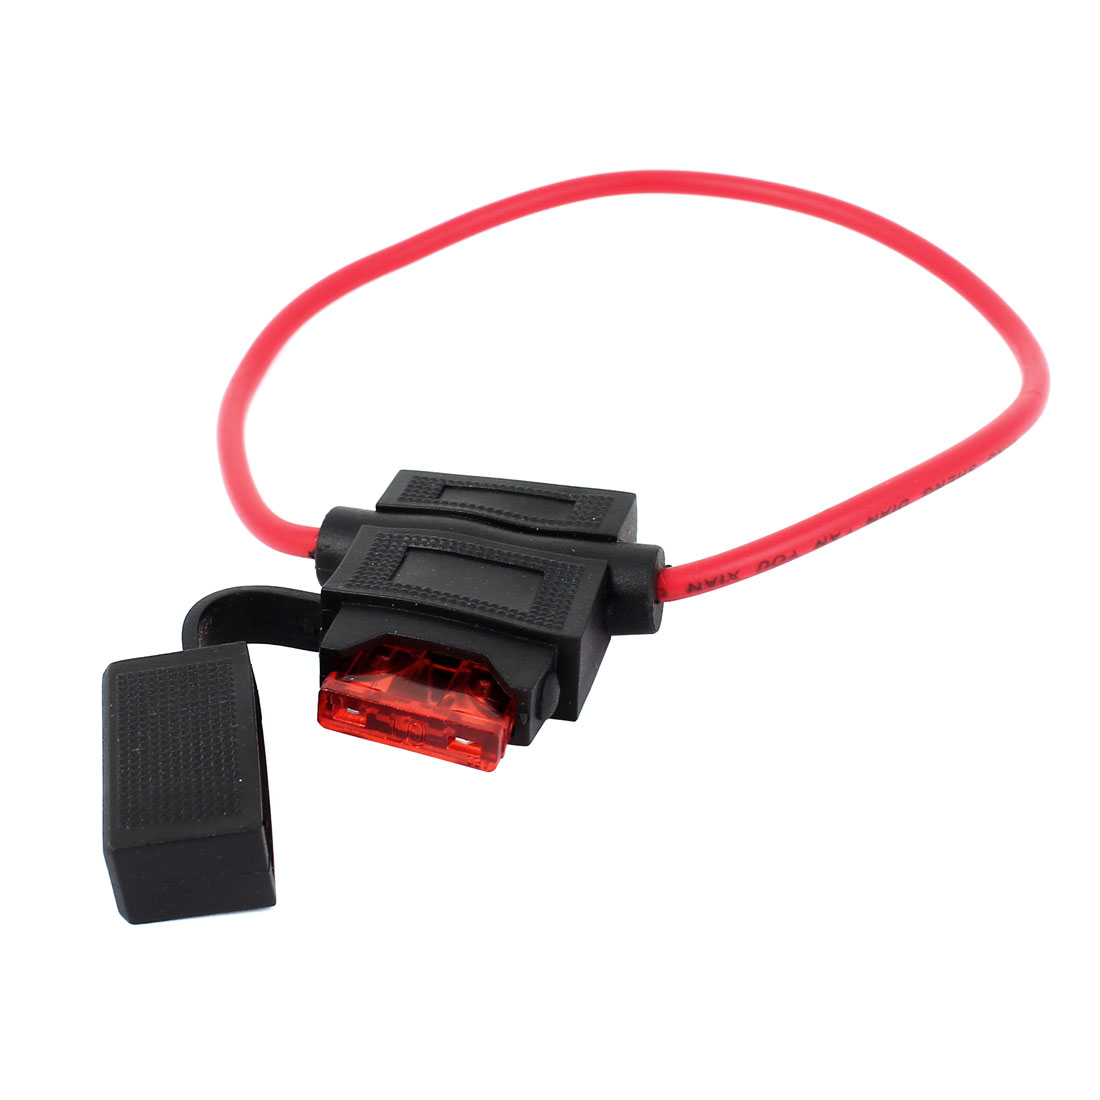 Unique Bargains Vehicle Car Waterproof Blade Type Inline Fuse Holder Case Black Red 32V 10A